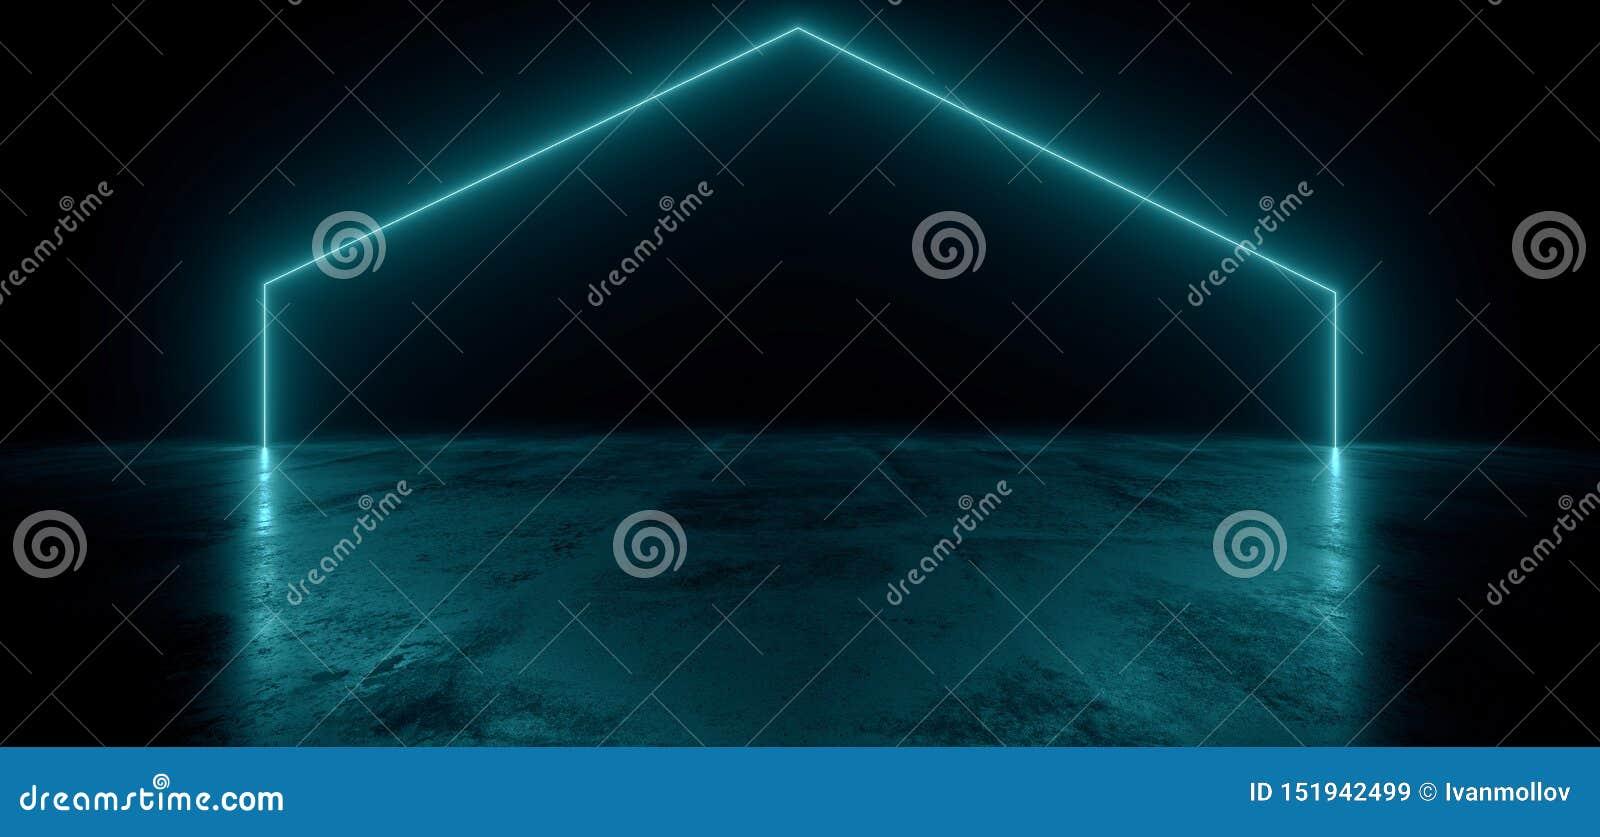 Virtuele Neonlaser het Gloeien Blauwe Trillend toont Nacht Donkere Lege Grunge Concrete Gestalte gegeven Lichten Heldere Bezinnin